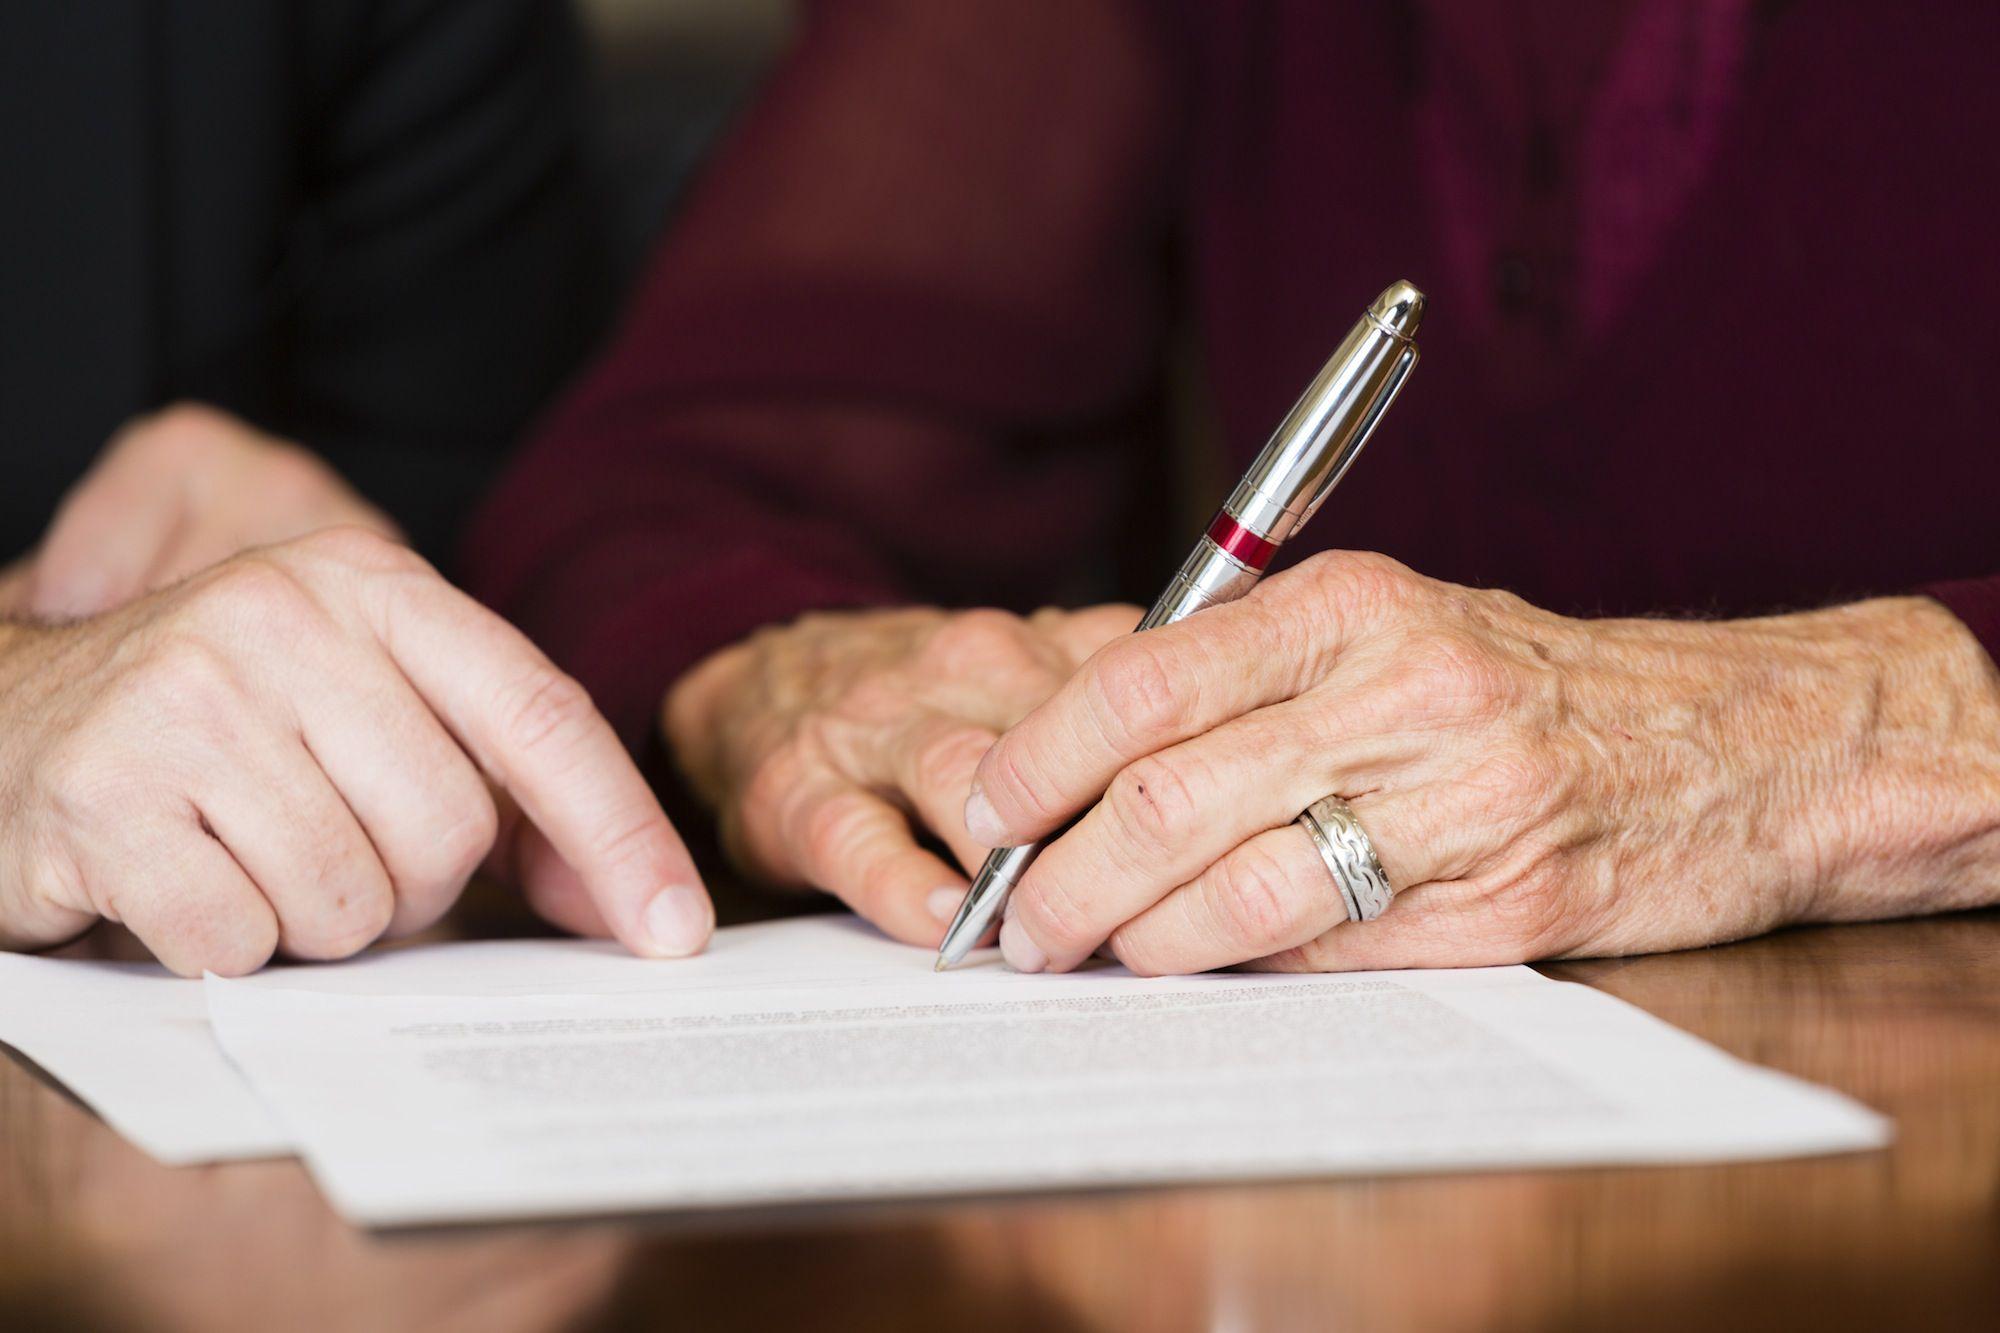 Irs form 709 definition and description senior contract falaconquin